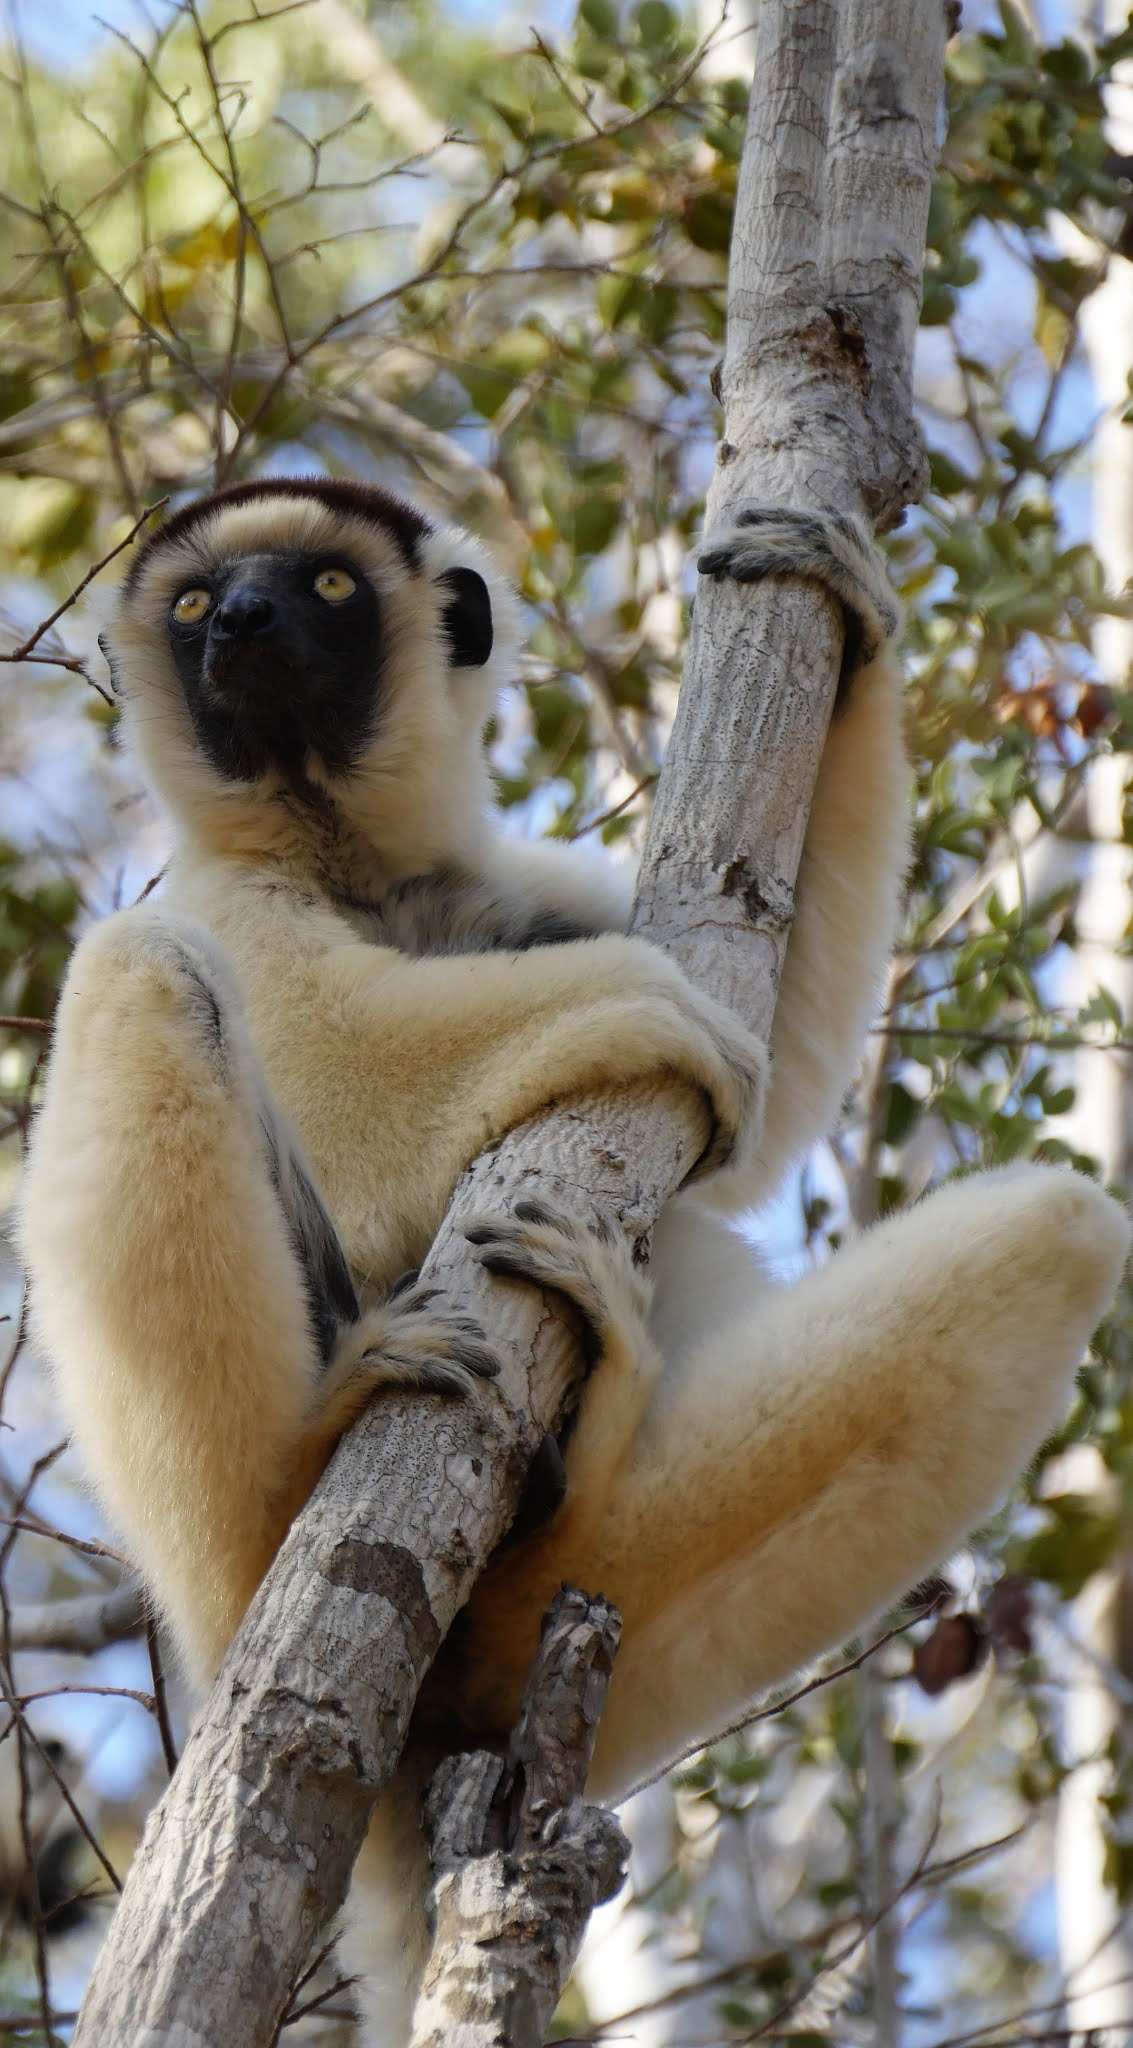 Lemur on a tree branch.